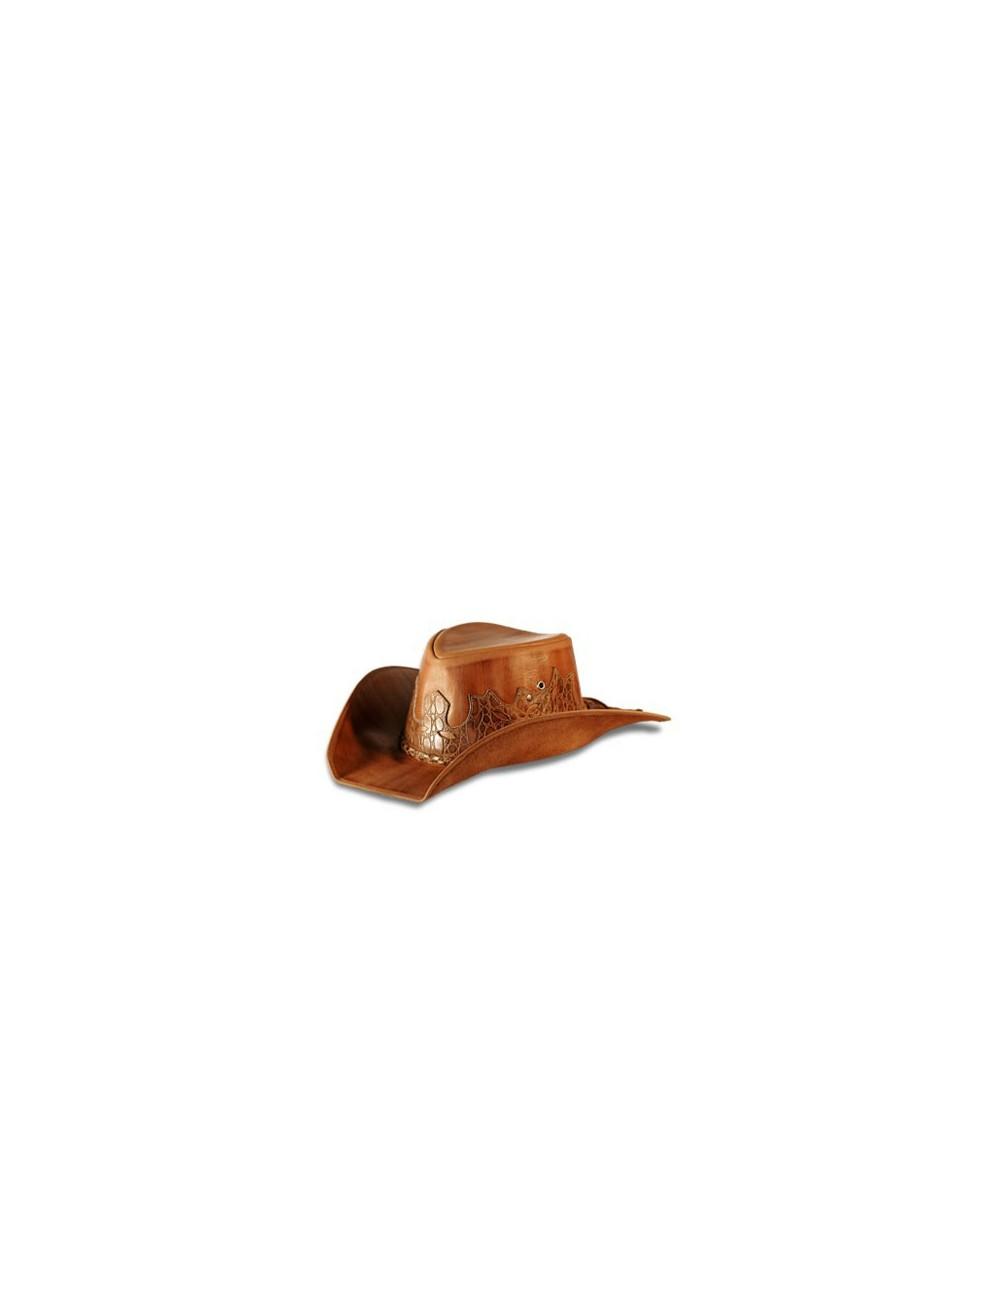 Chapeaux western cuir - Chapeau cowboy cuir marron